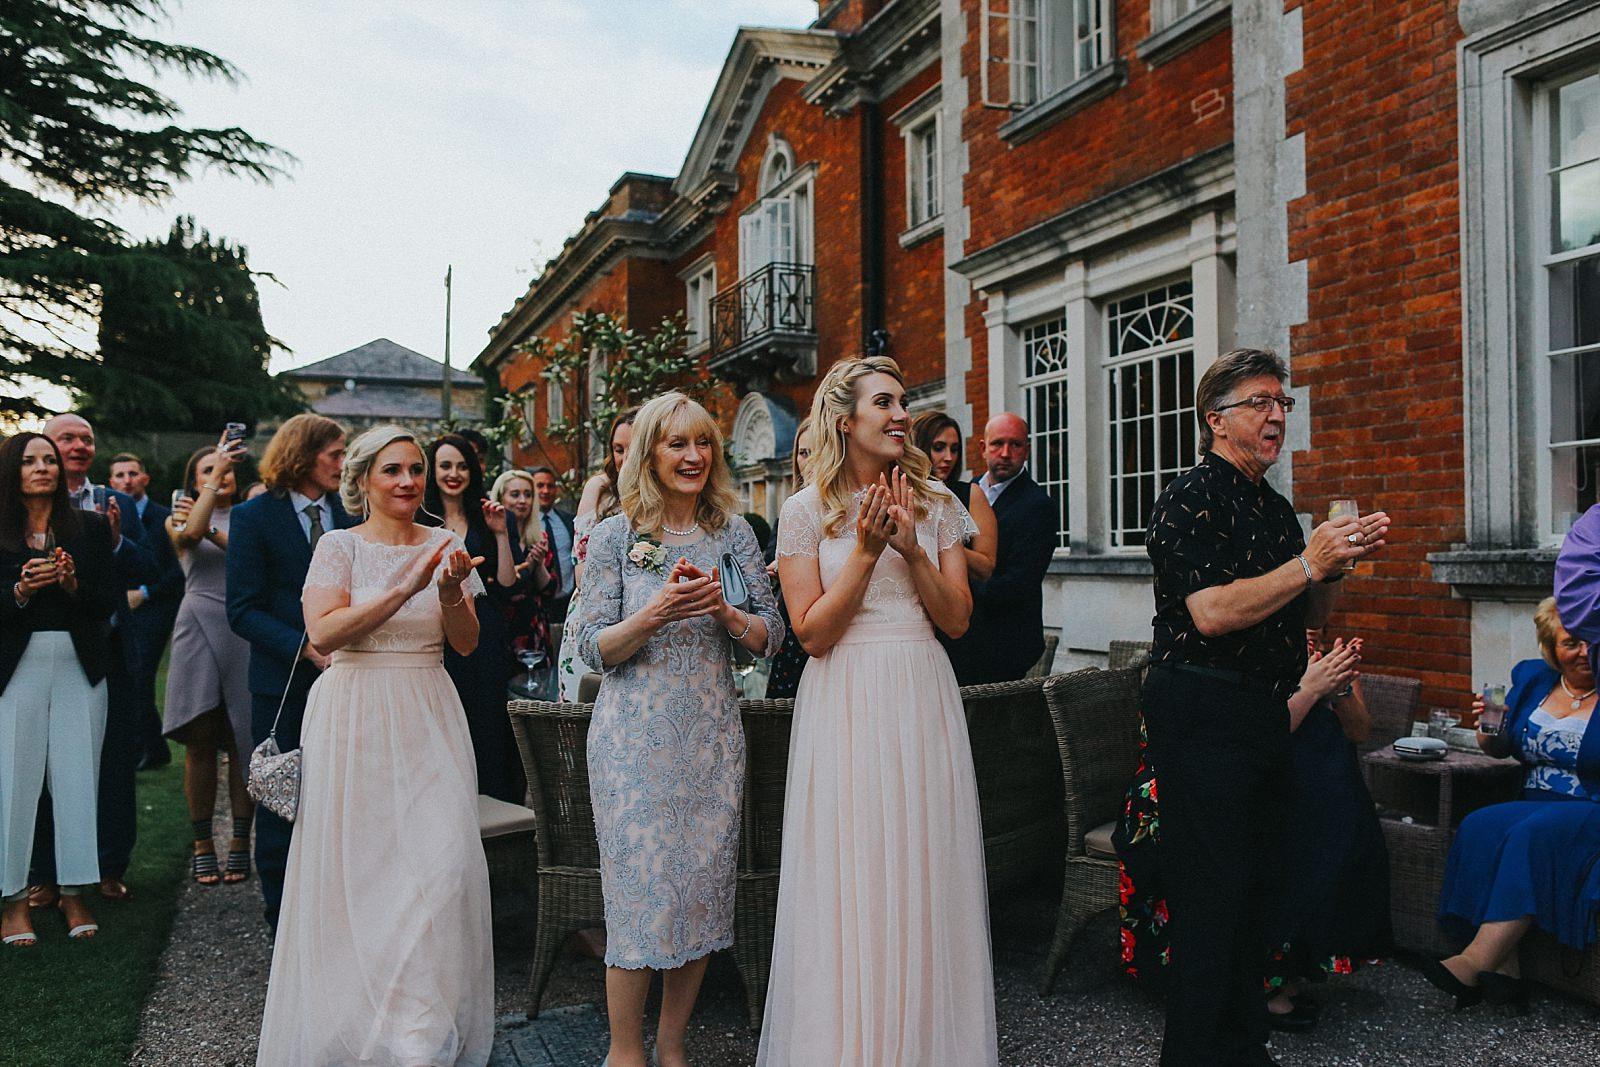 guests congratulate the happy couple